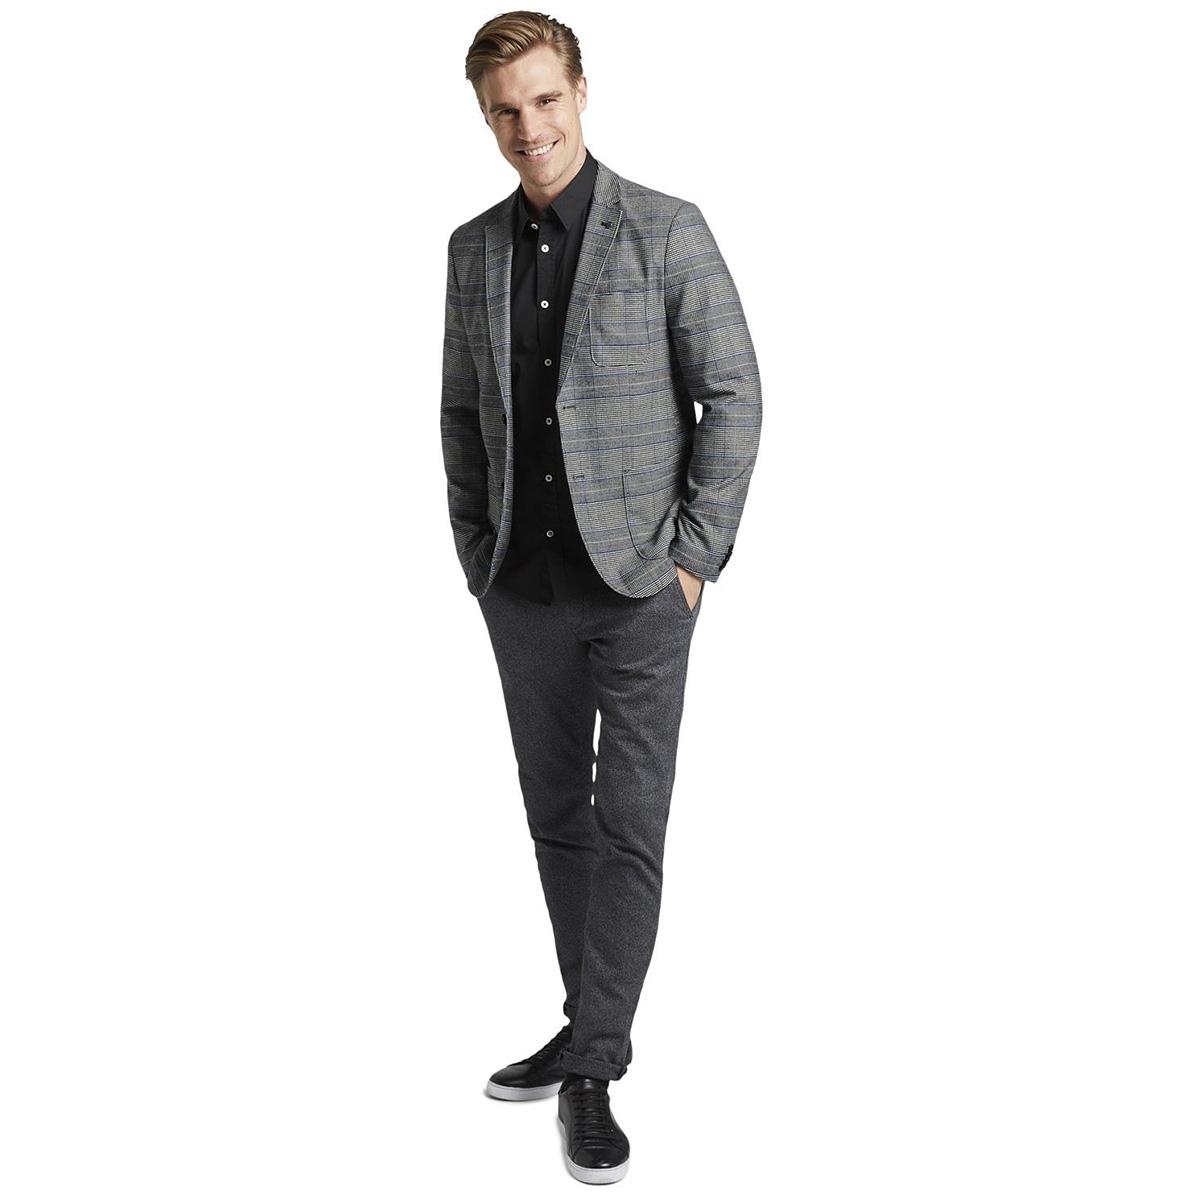 effen overhemd 1015320xx10 tom tailor overhemd 10337